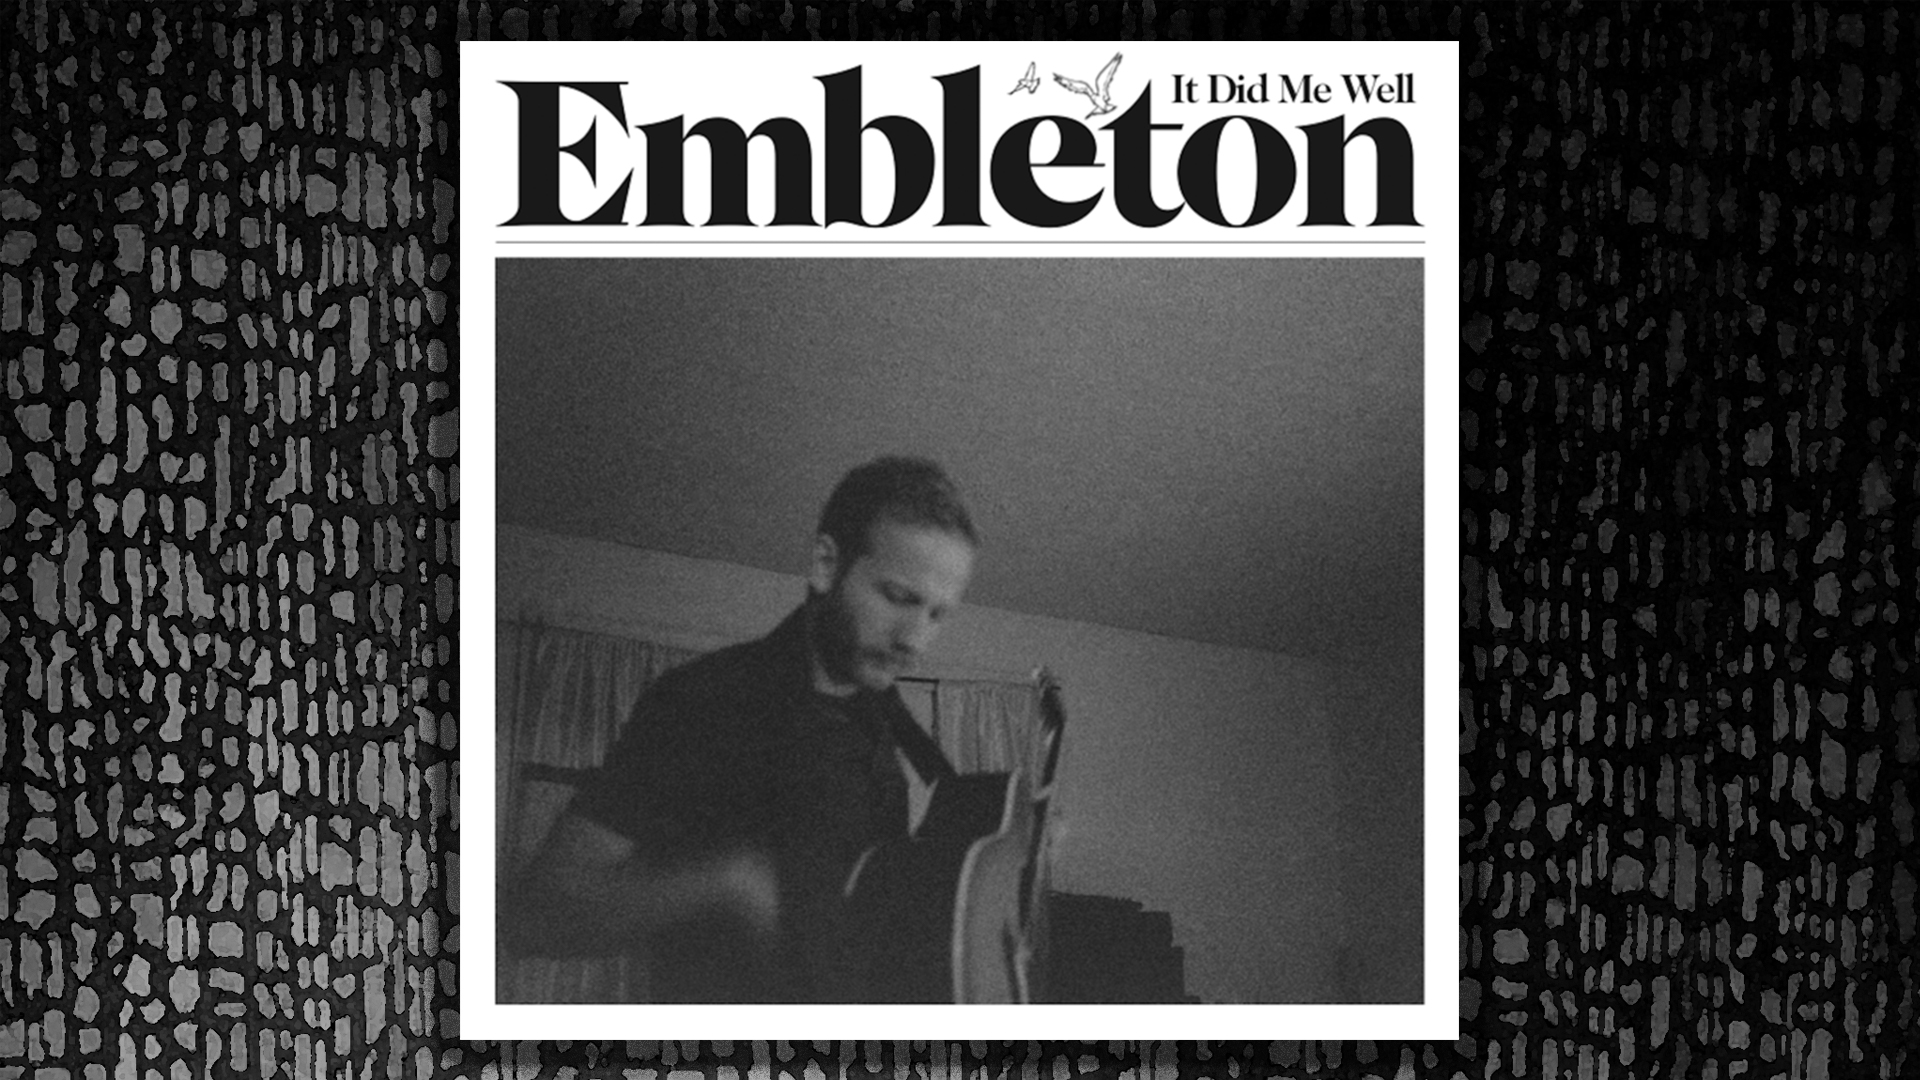 It did me well, Embleton